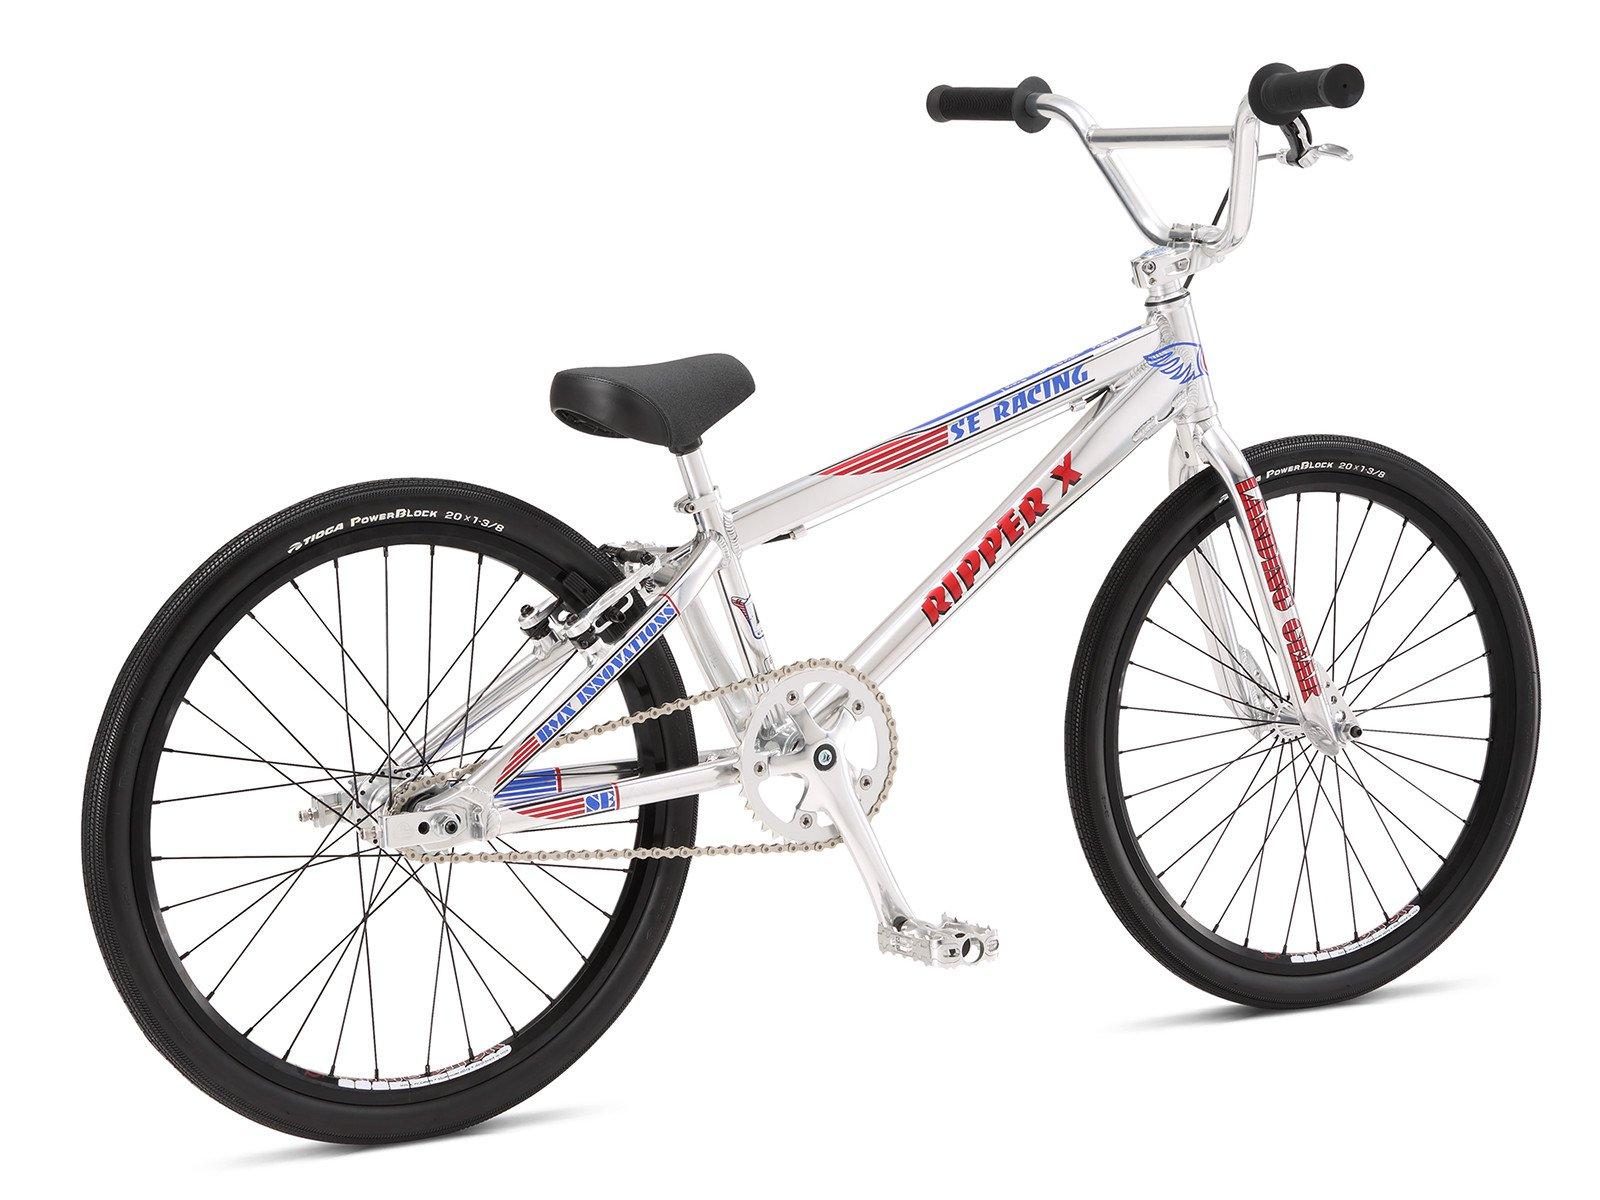 se bikes ripper expert 2017 bmx race bike high polish. Black Bedroom Furniture Sets. Home Design Ideas